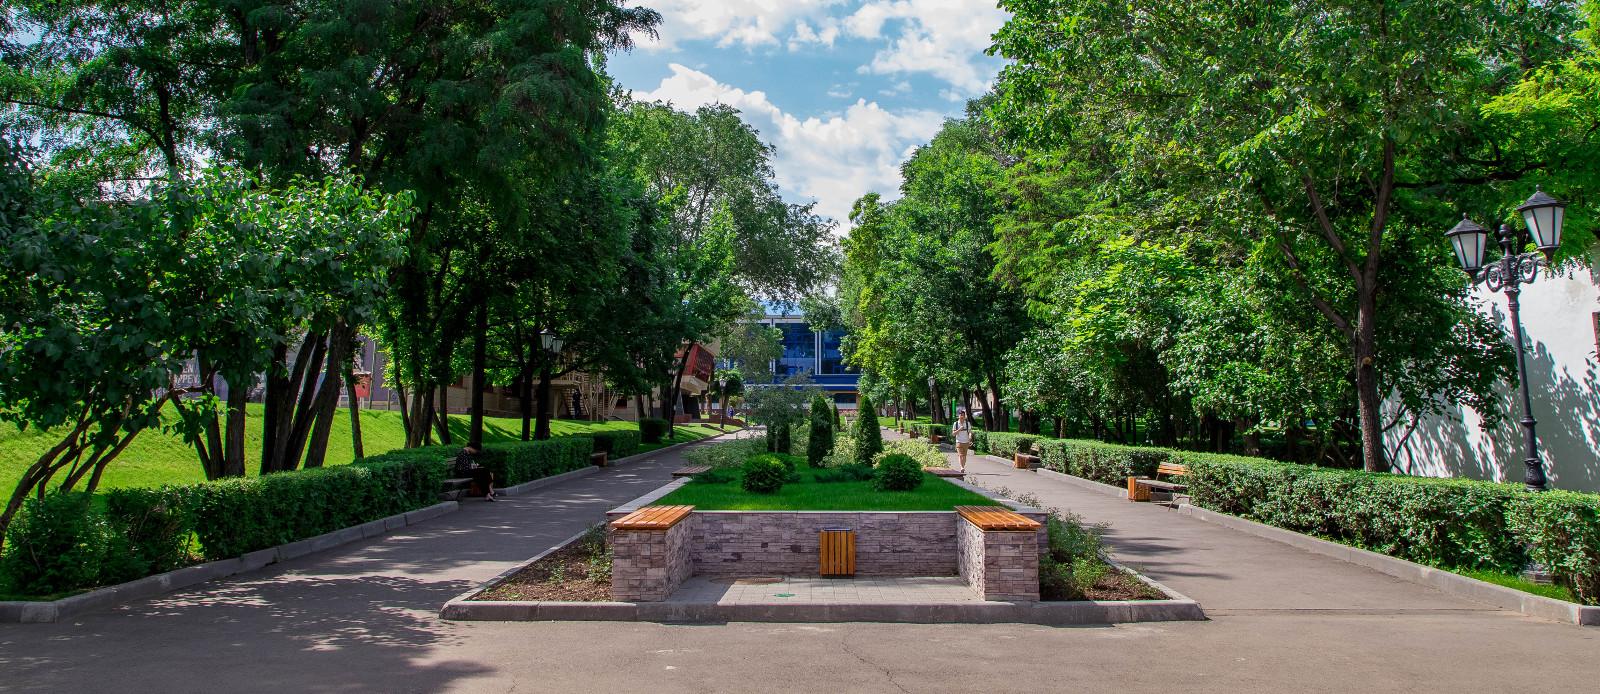 Summer campus photo